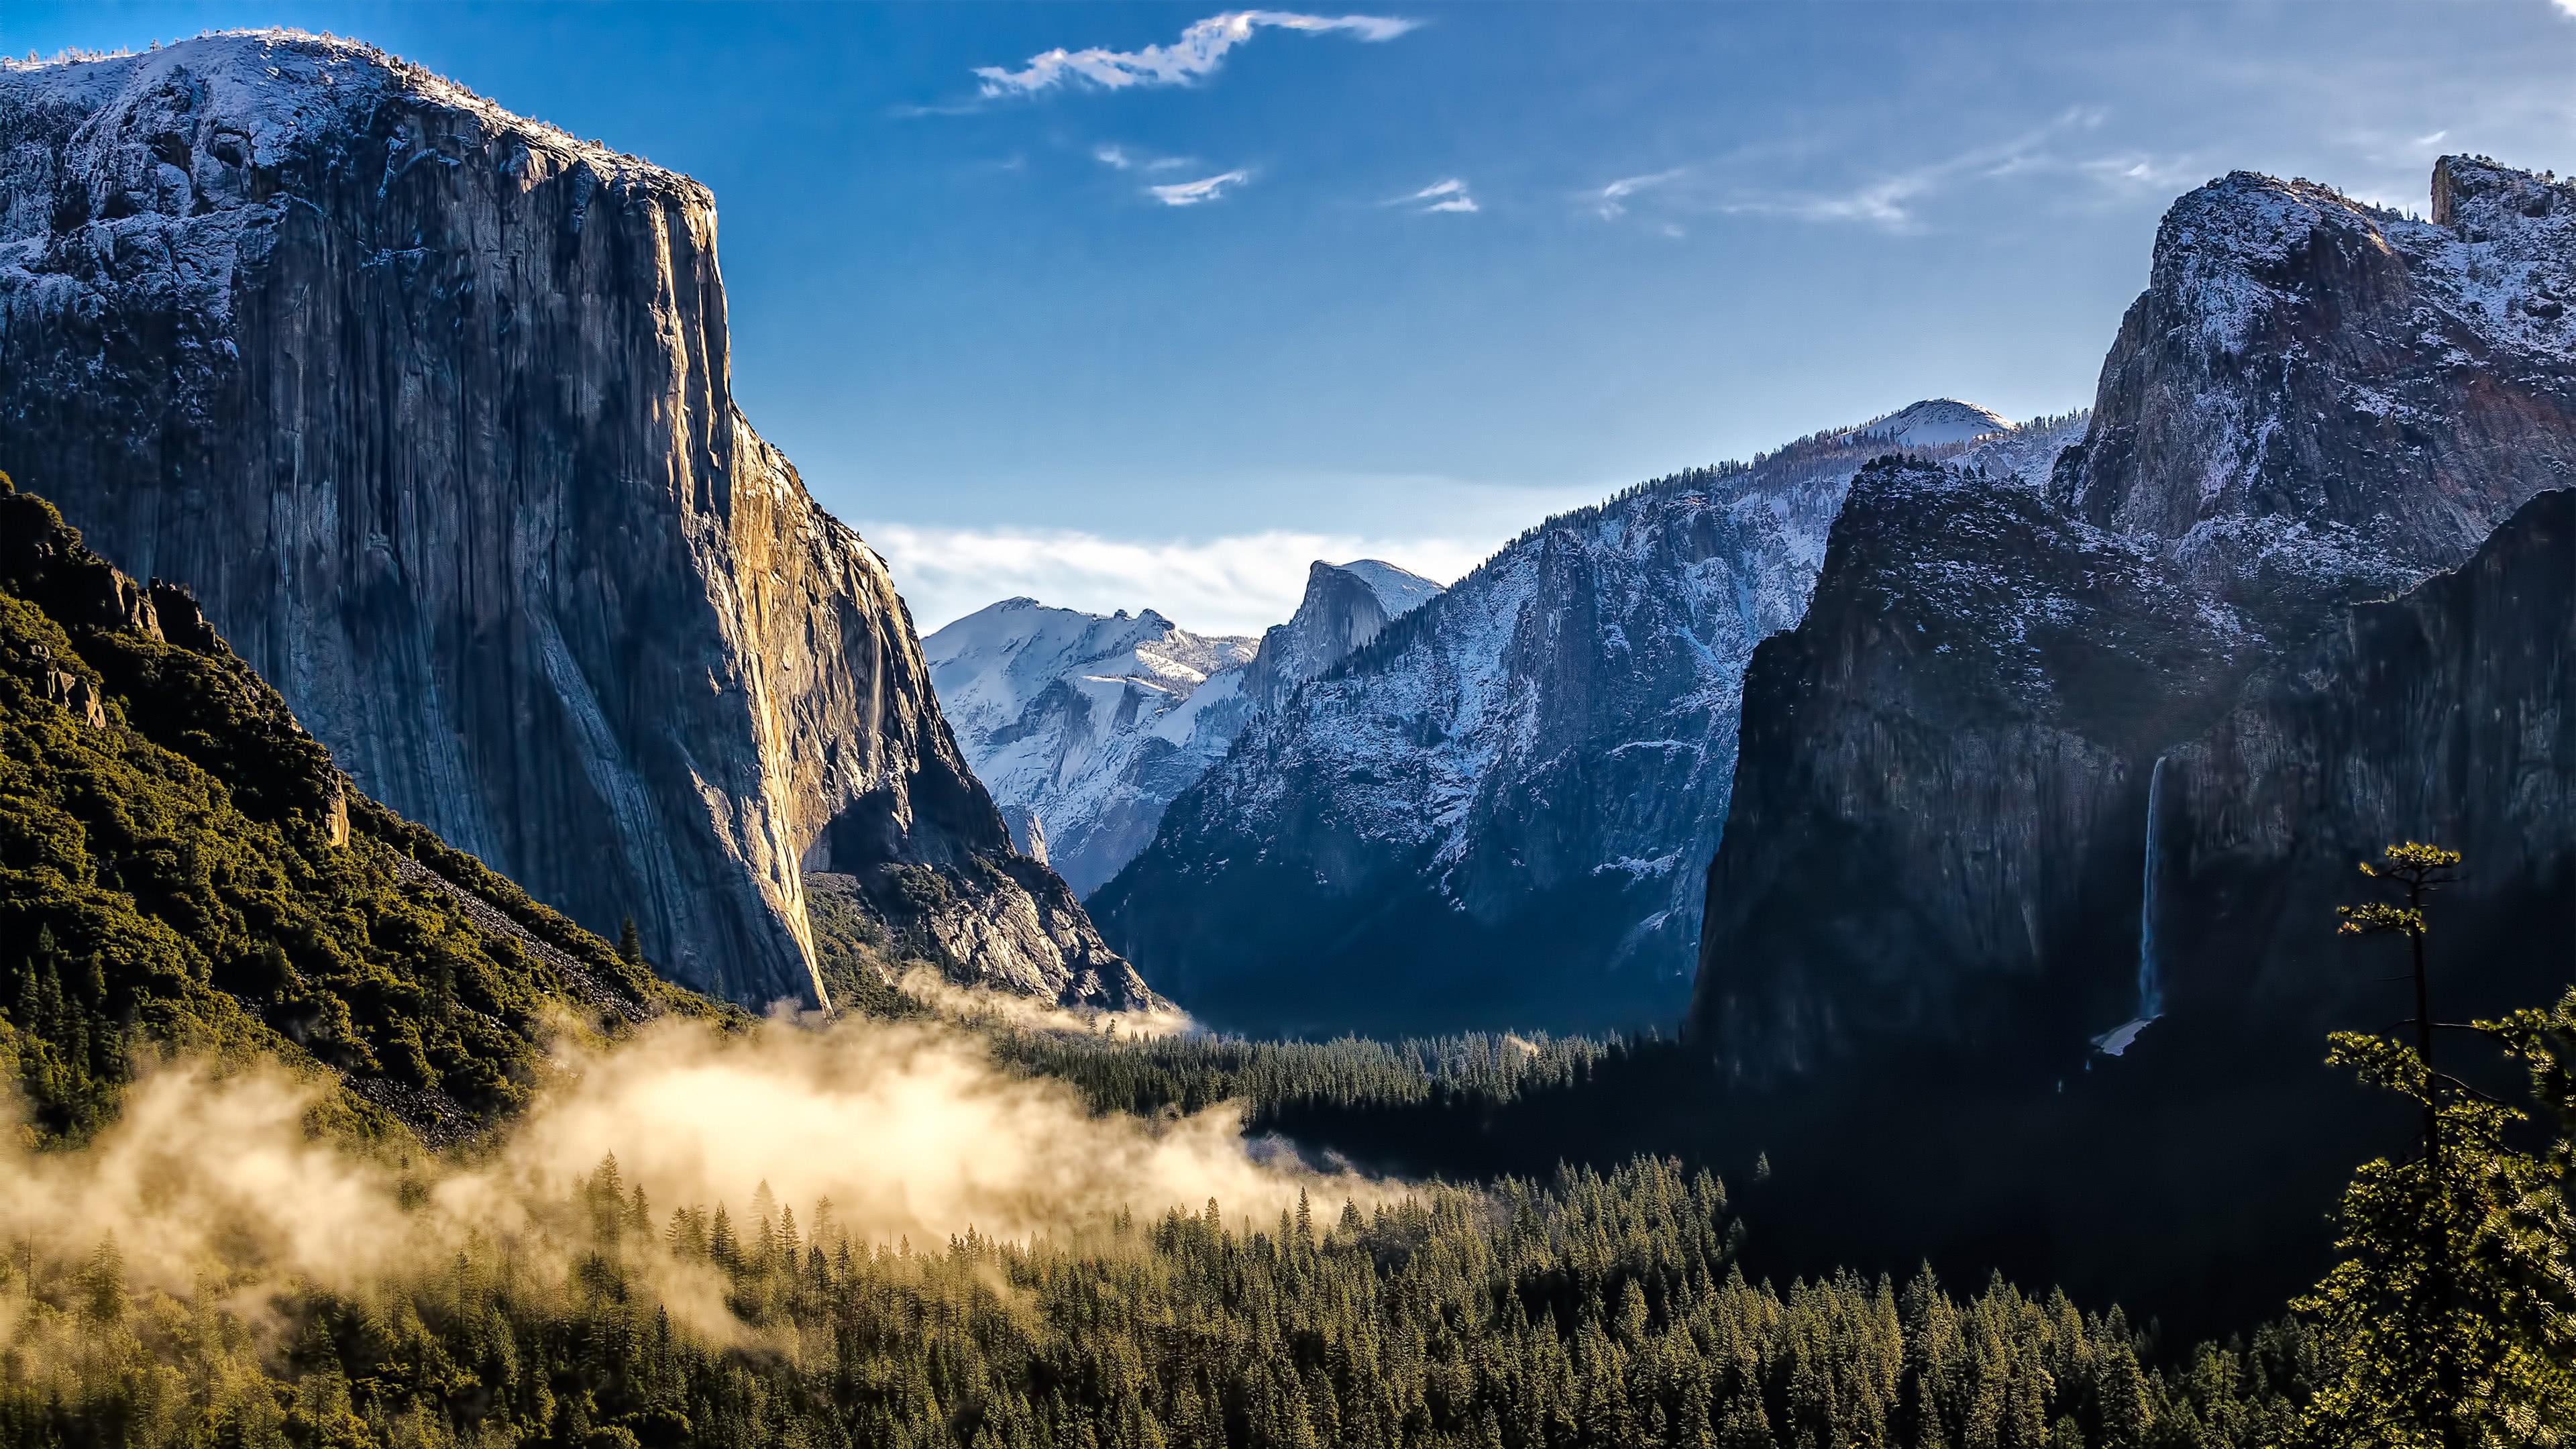 el capitan rock formation yosemite national park california united states 4k wallpaper